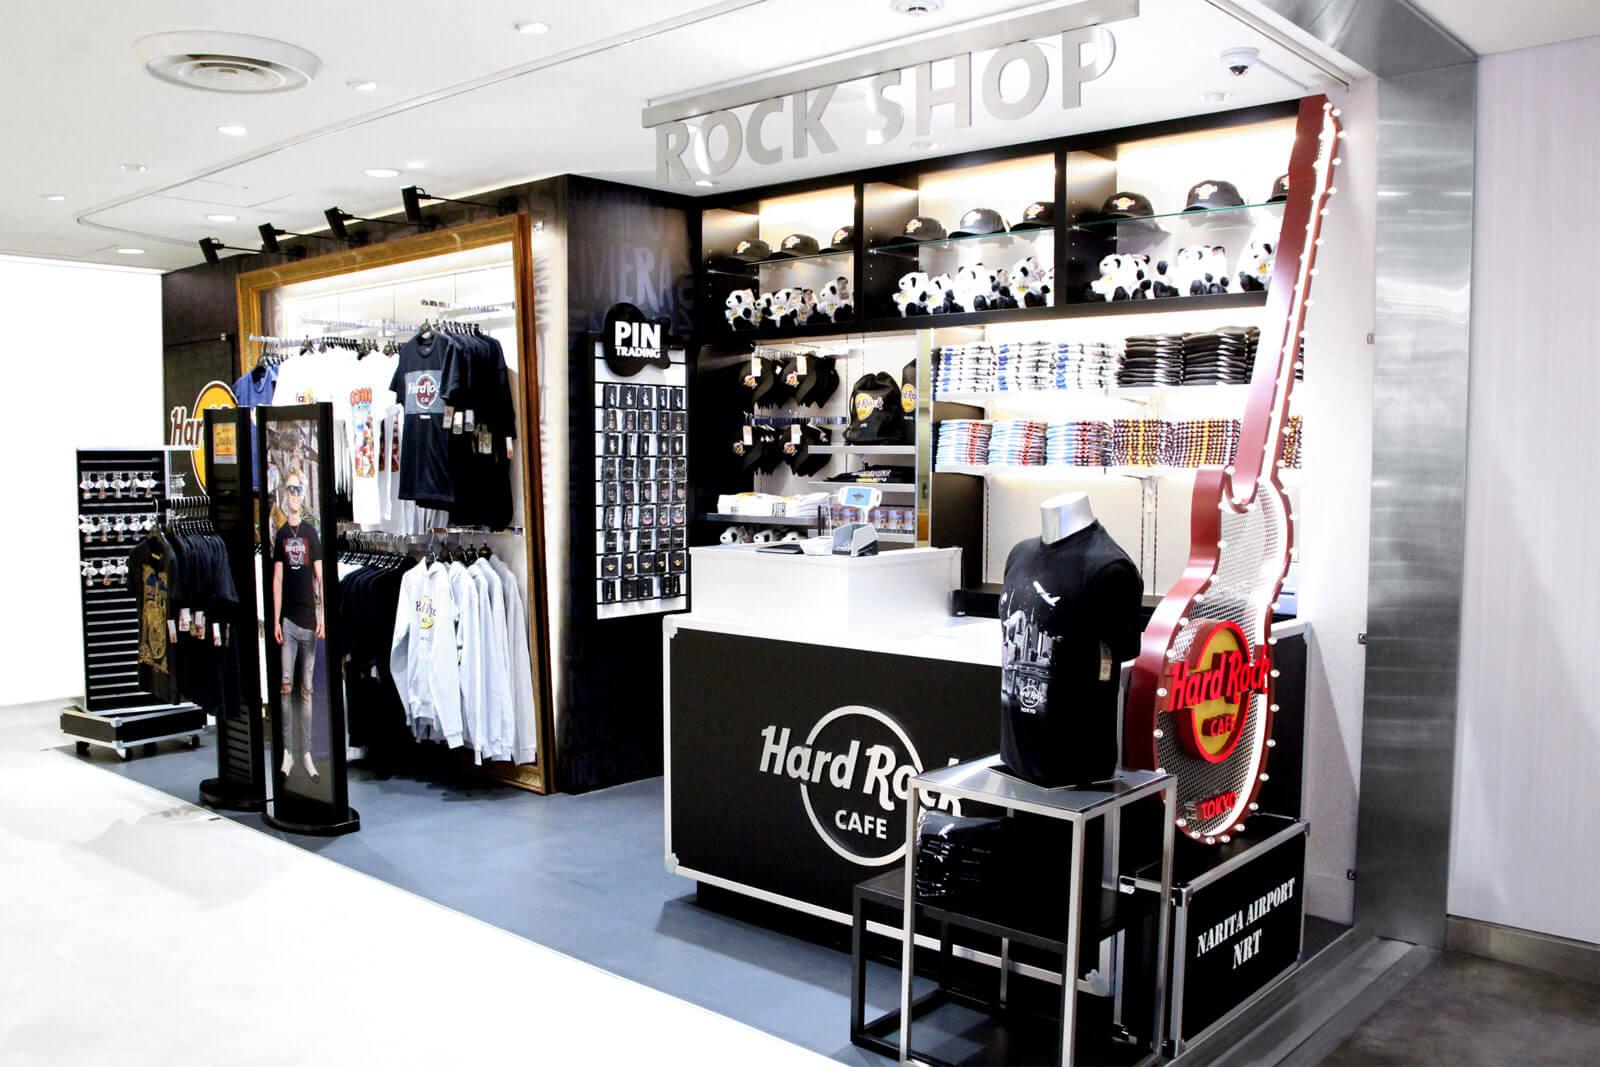 Garden Centre: Hard Rock Cafe Japan – ハードロックカフェ・ジャパン